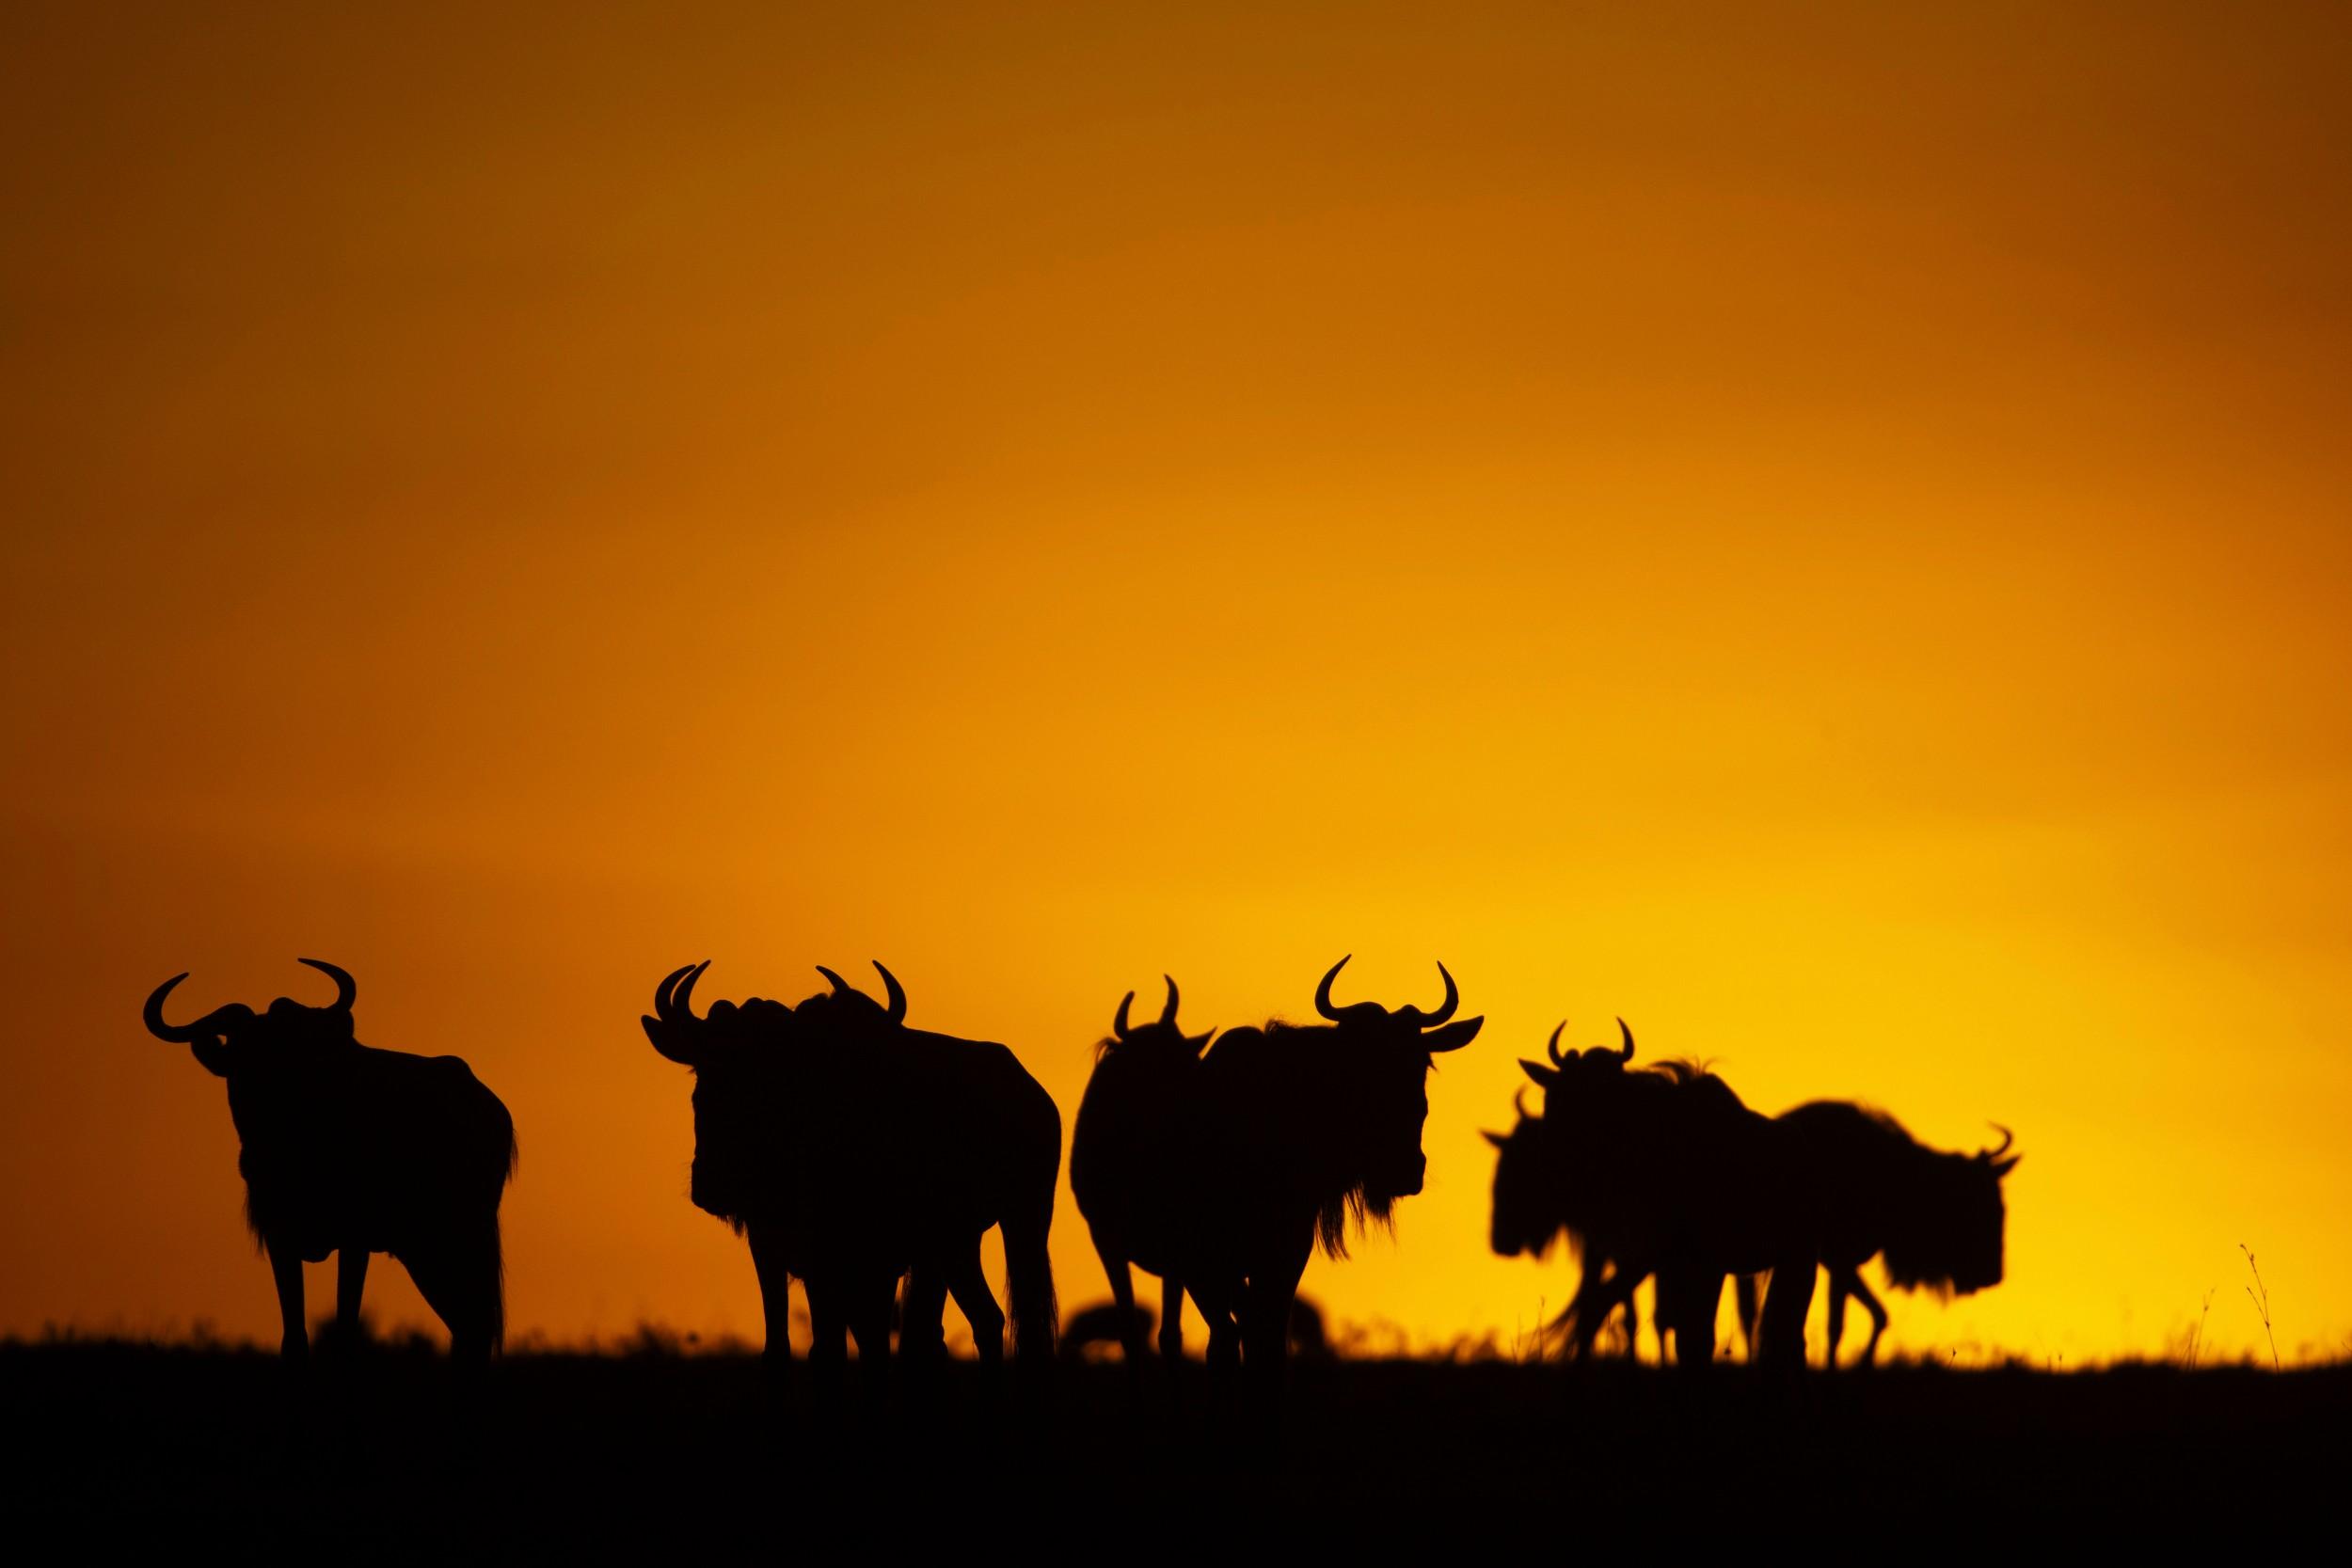 MaraExpeditionCamp-Wildlife-GreatPlainsConservation-21.jpg